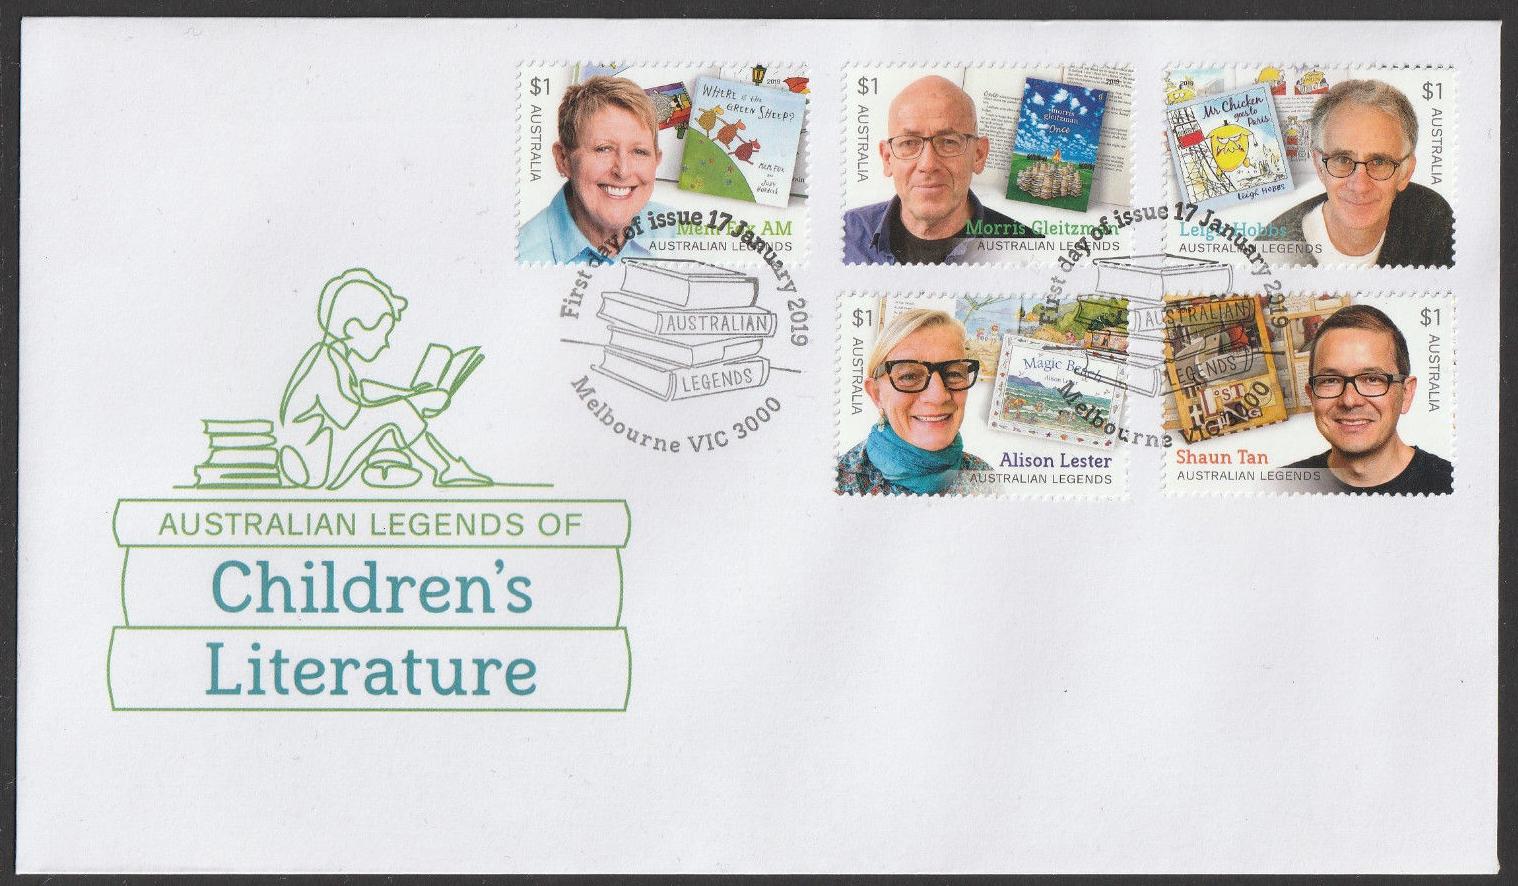 Australia - Australian Legends of Children's Literature (January 17, 2019) first day cover